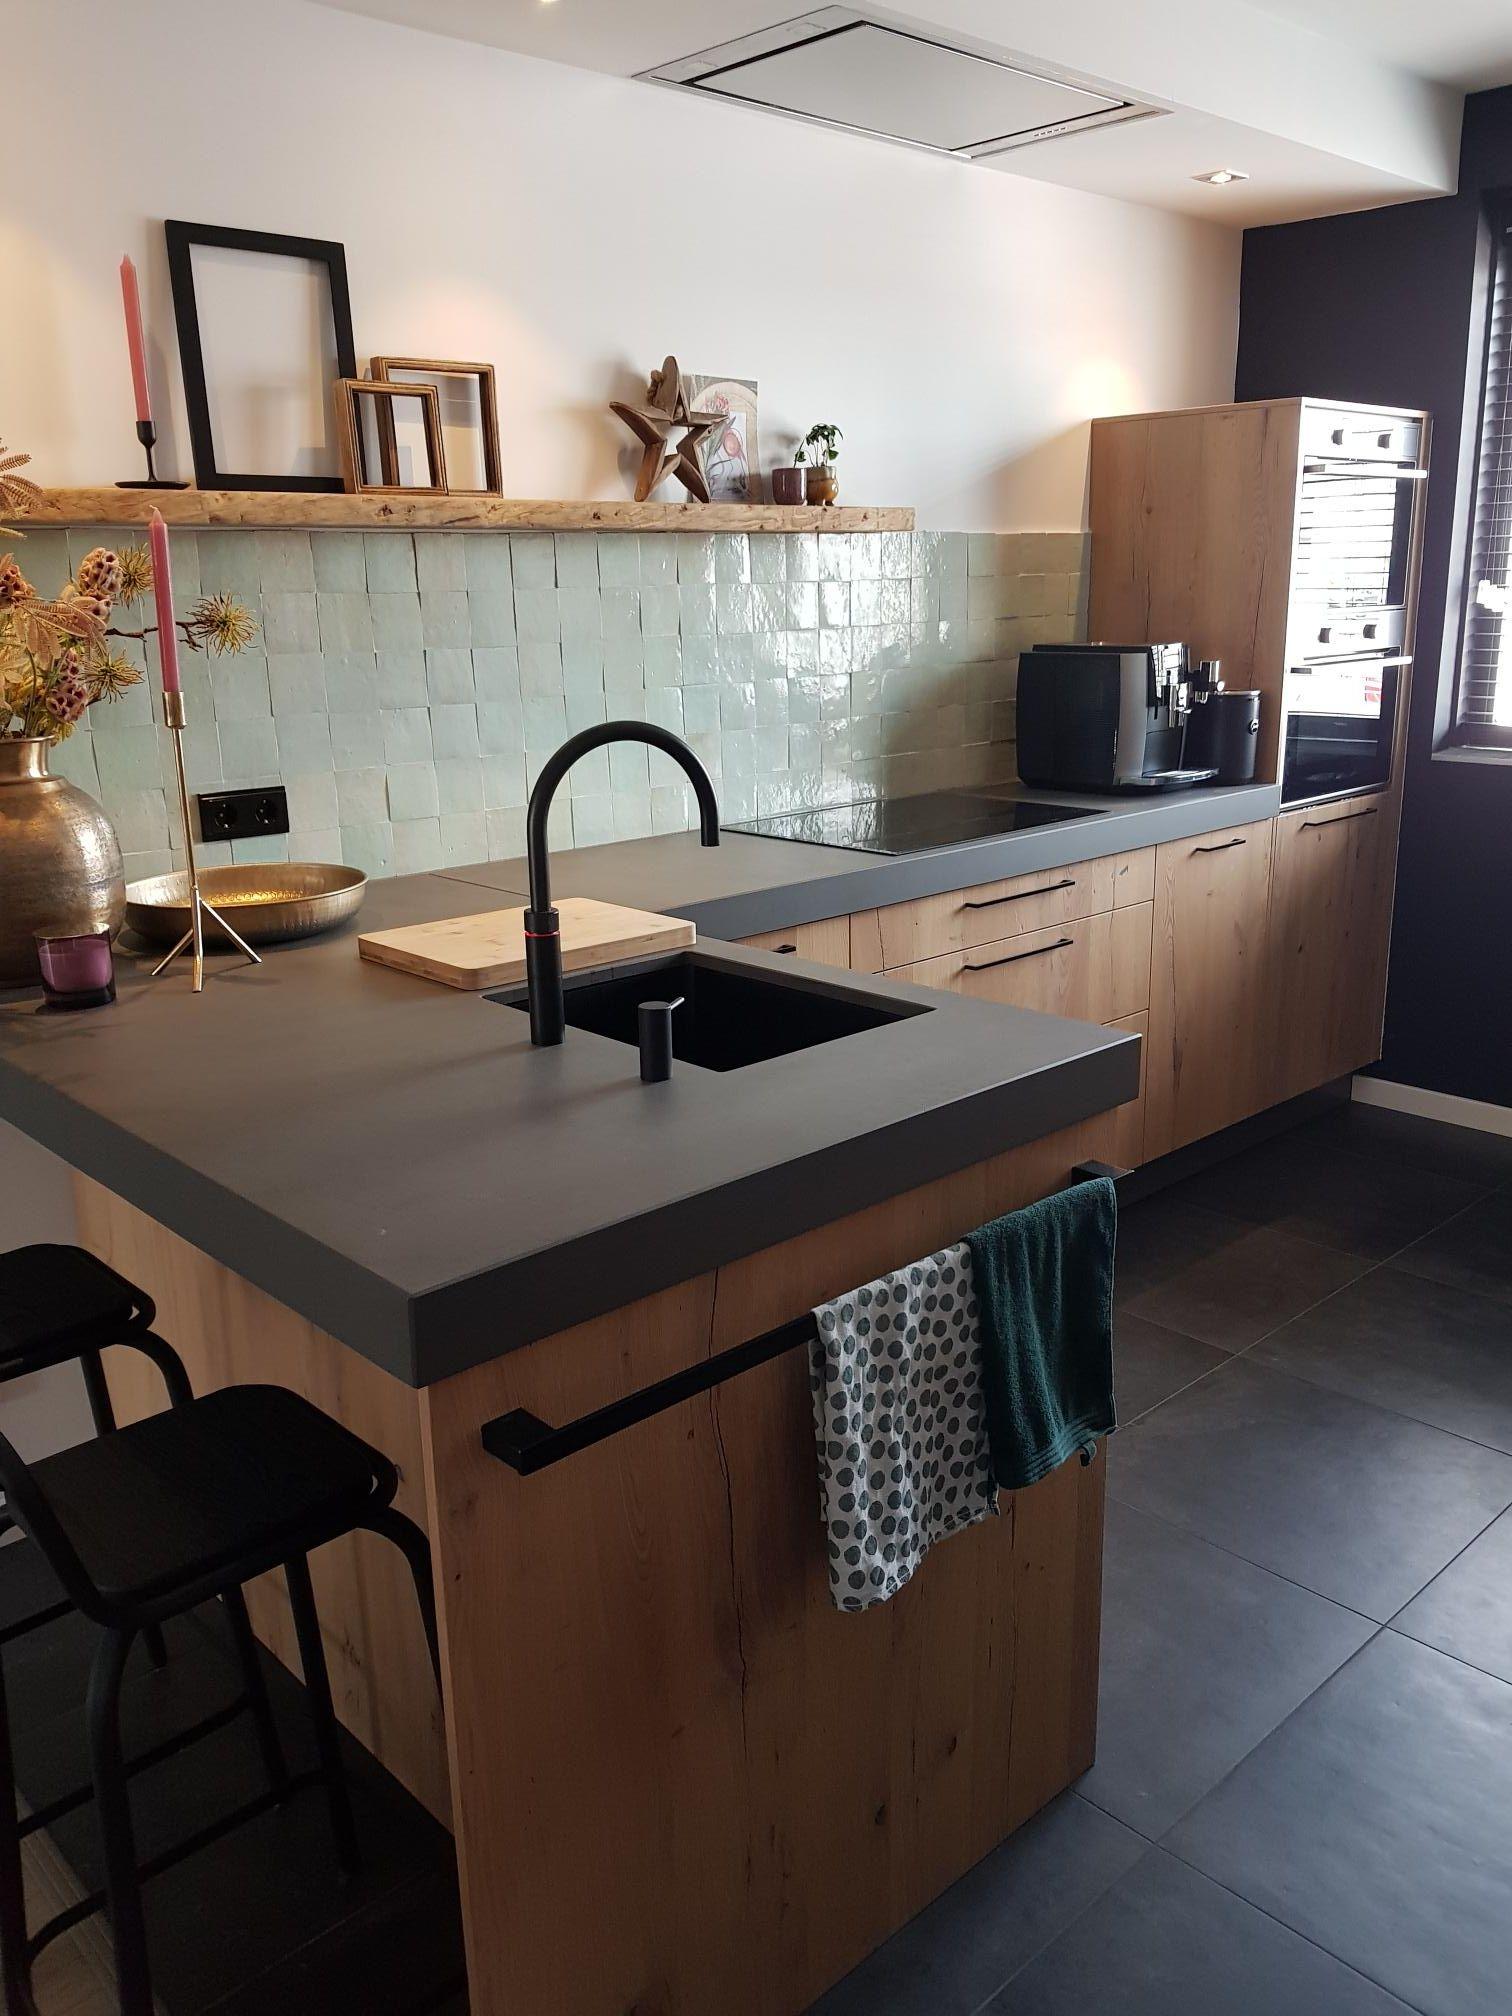 Pin Van Makayla Op Pha Keuken Interieur Keuken Ontwerp Keuken Ontwerpen